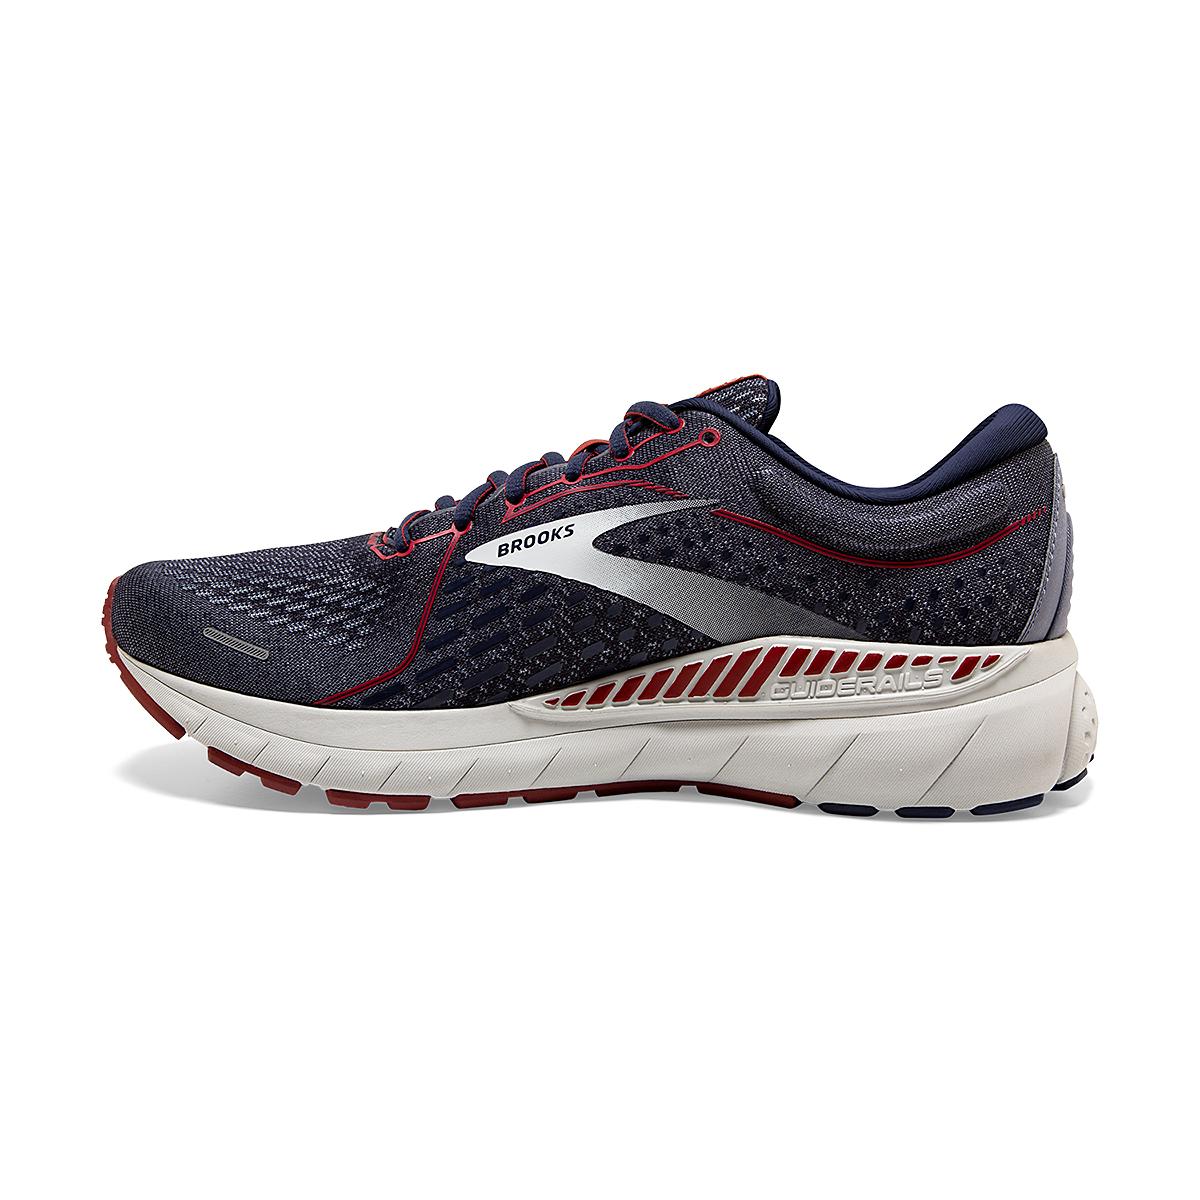 Men's Brooks Adrenaline GTS 21 Running Shoe - Color: Peacoat/Grey/Red - Size: 7 - Width: Regular, Peacoat/Grey/Red, large, image 2